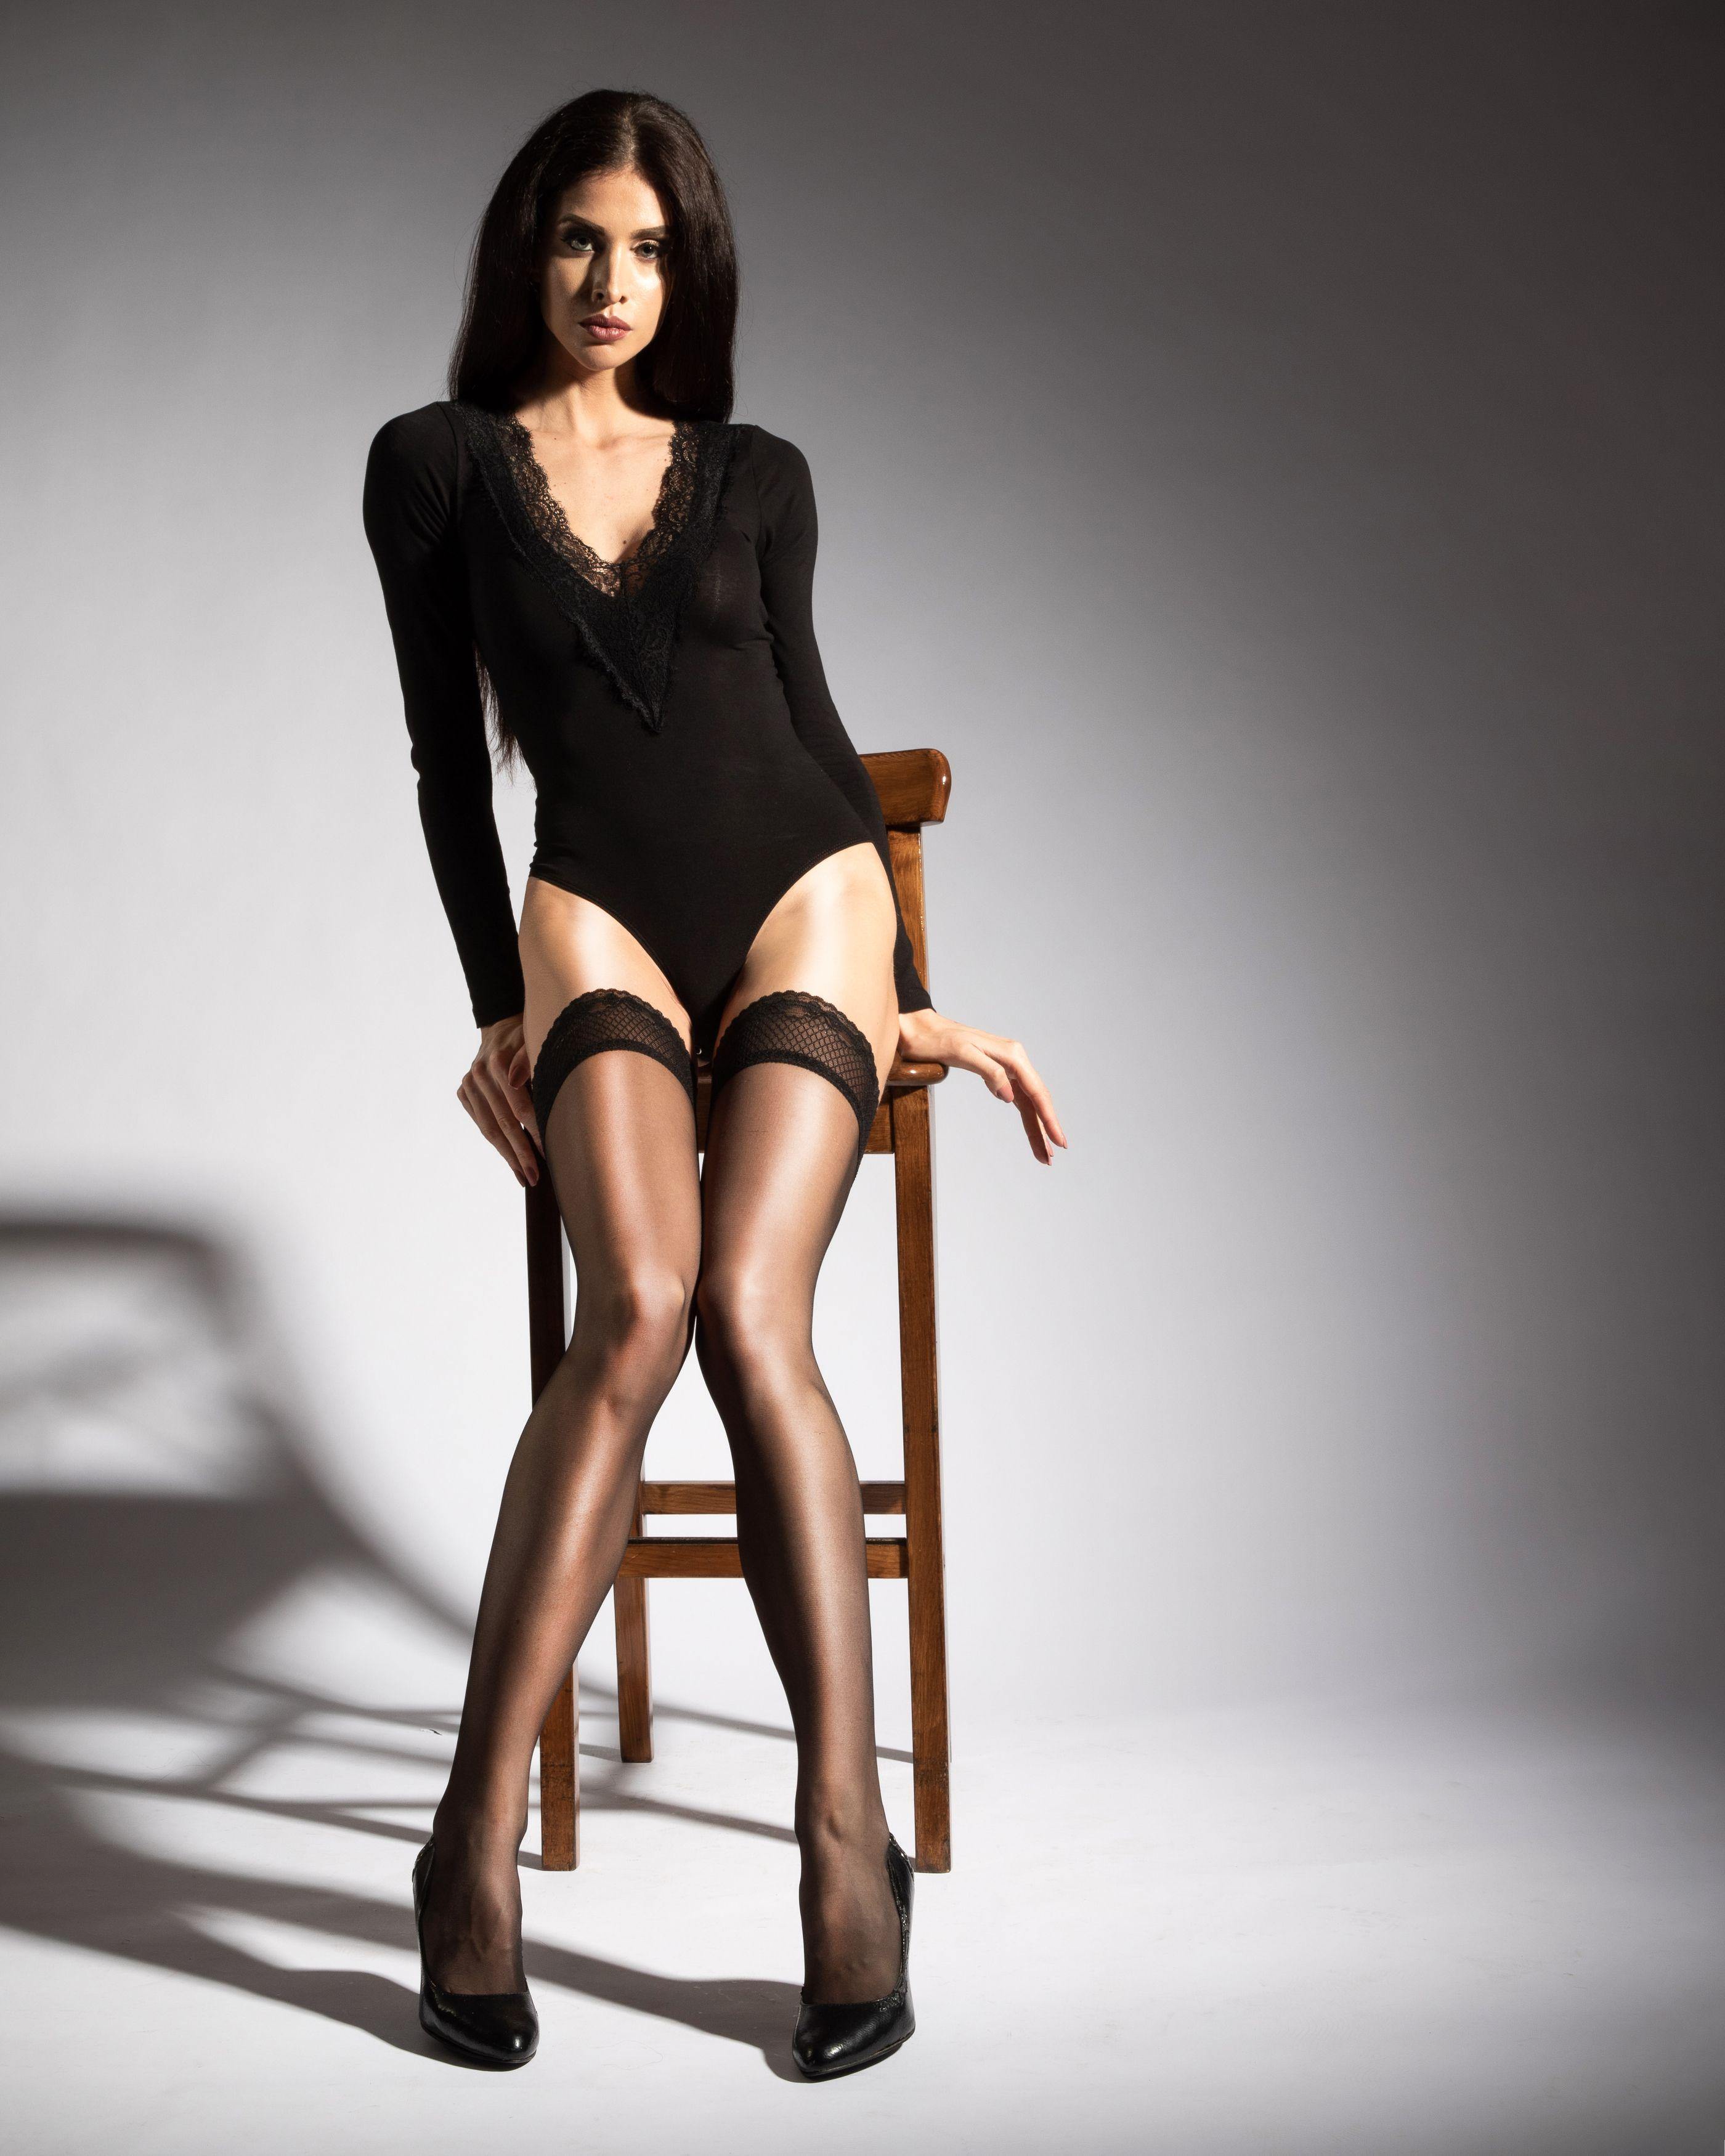 девушка,красивая,боди,чулки, Дмитрий Александров